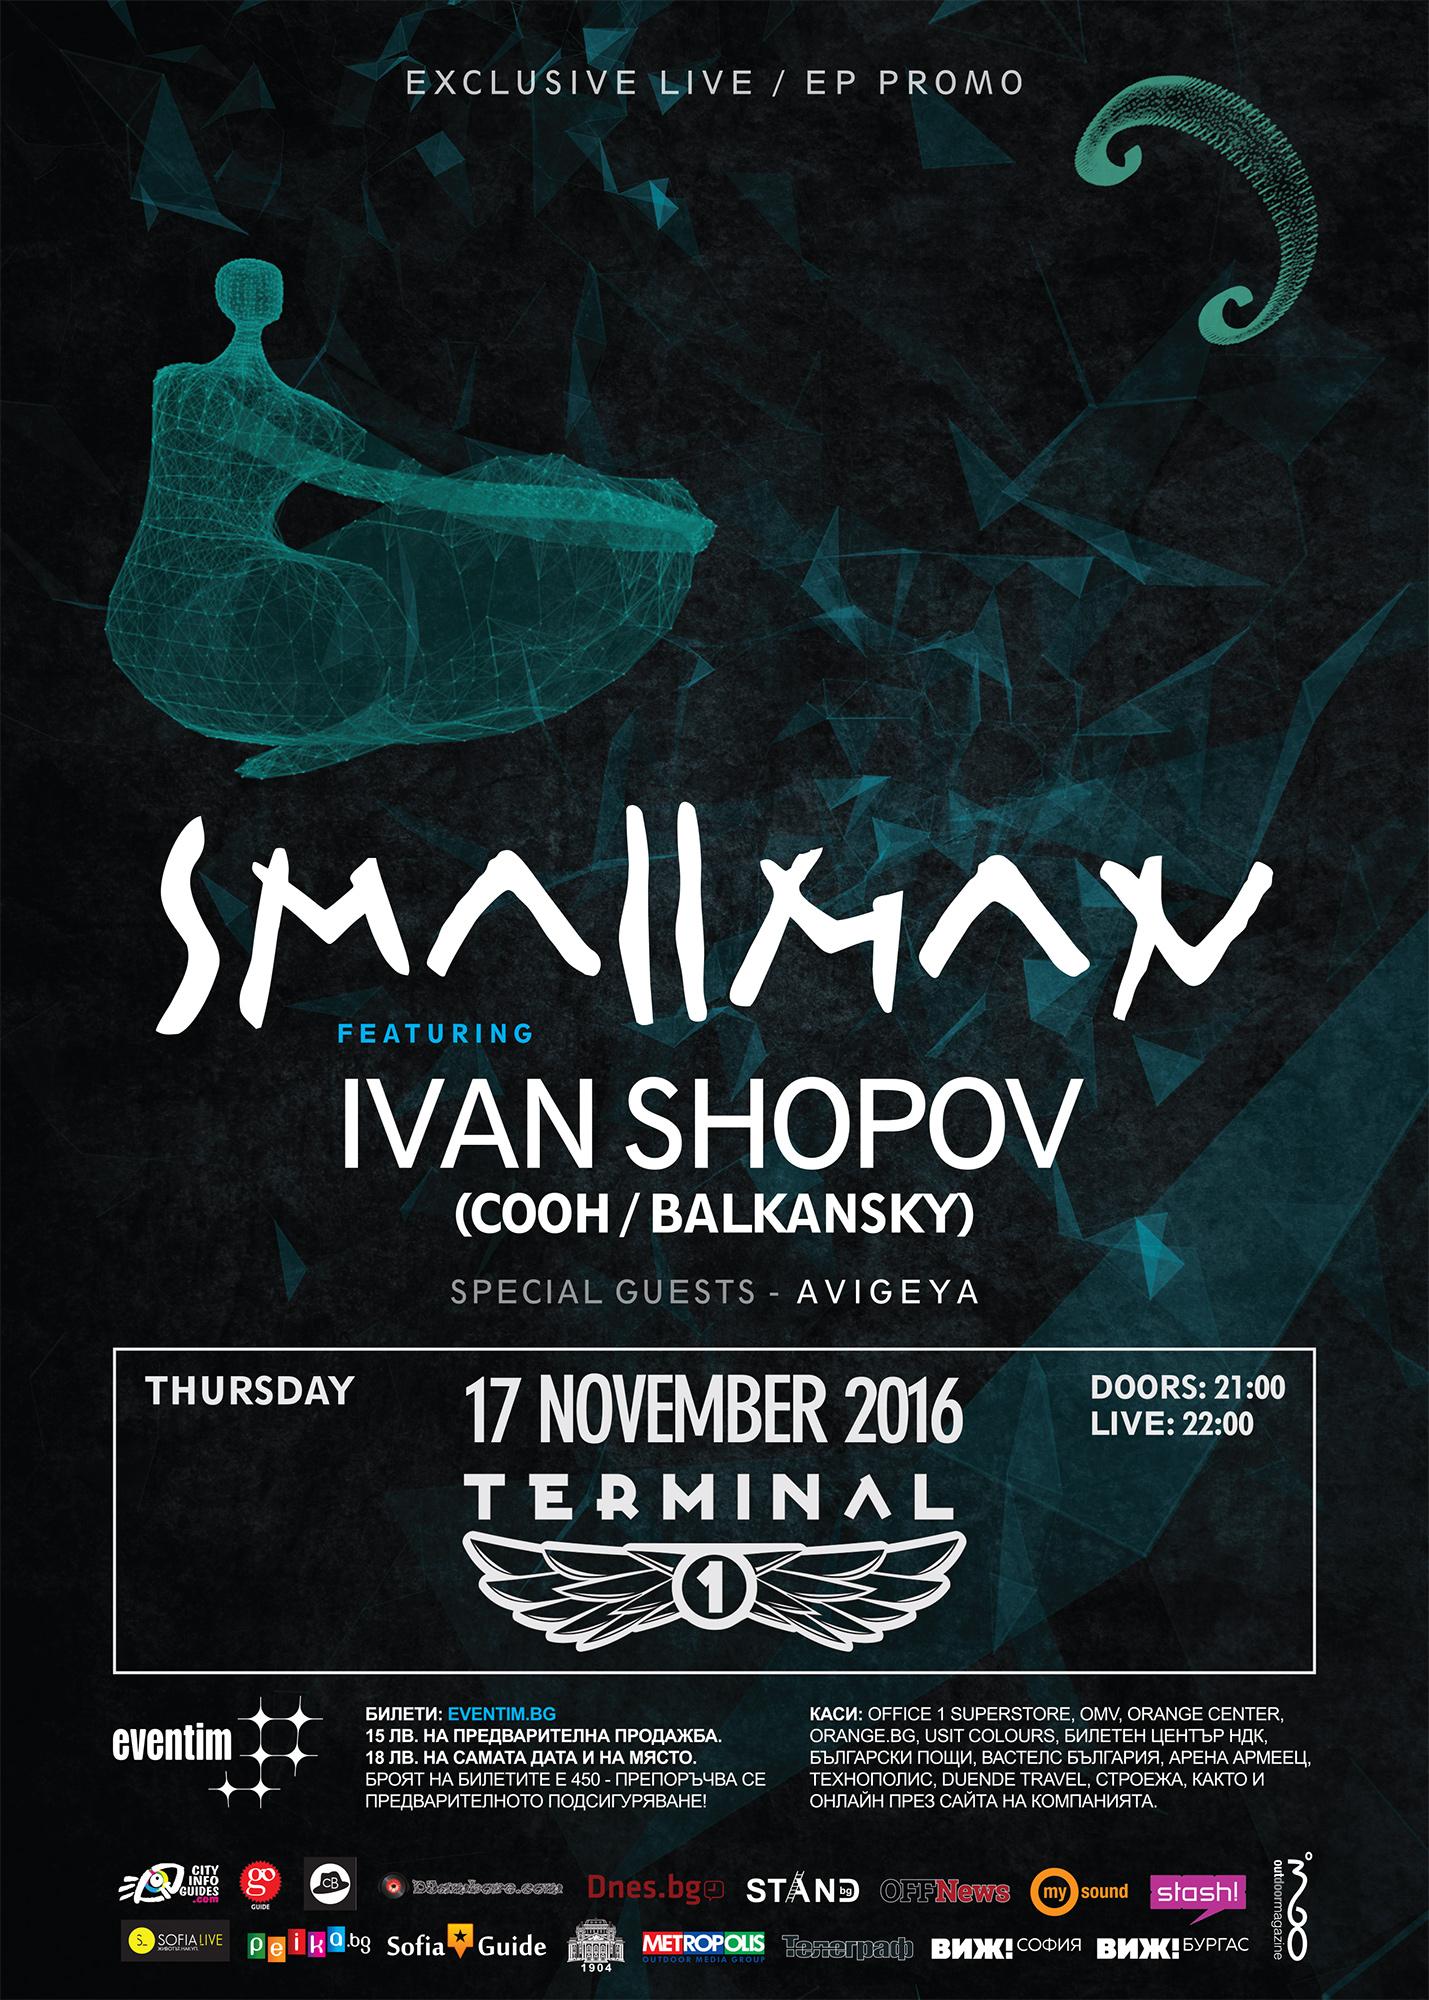 smallman_ep_promo_poster_50x70_web_prvw